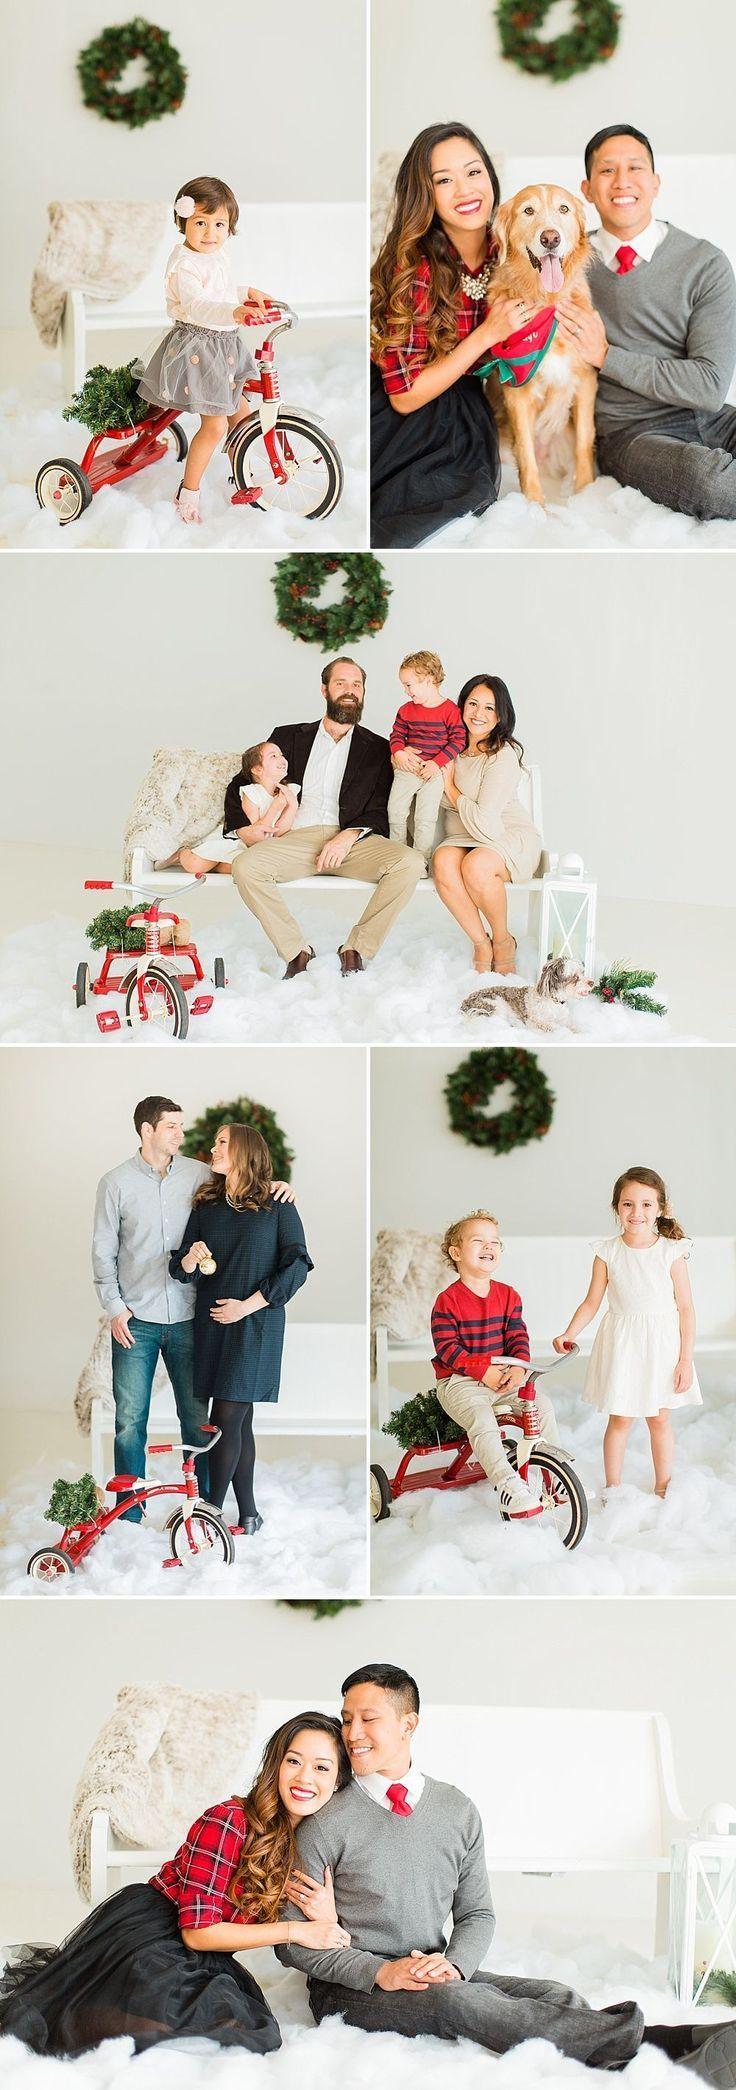 Christmas Mini Sessions for Harvey Relief | Houston, Texas -   14 christmas photoshoot couples studio ideas